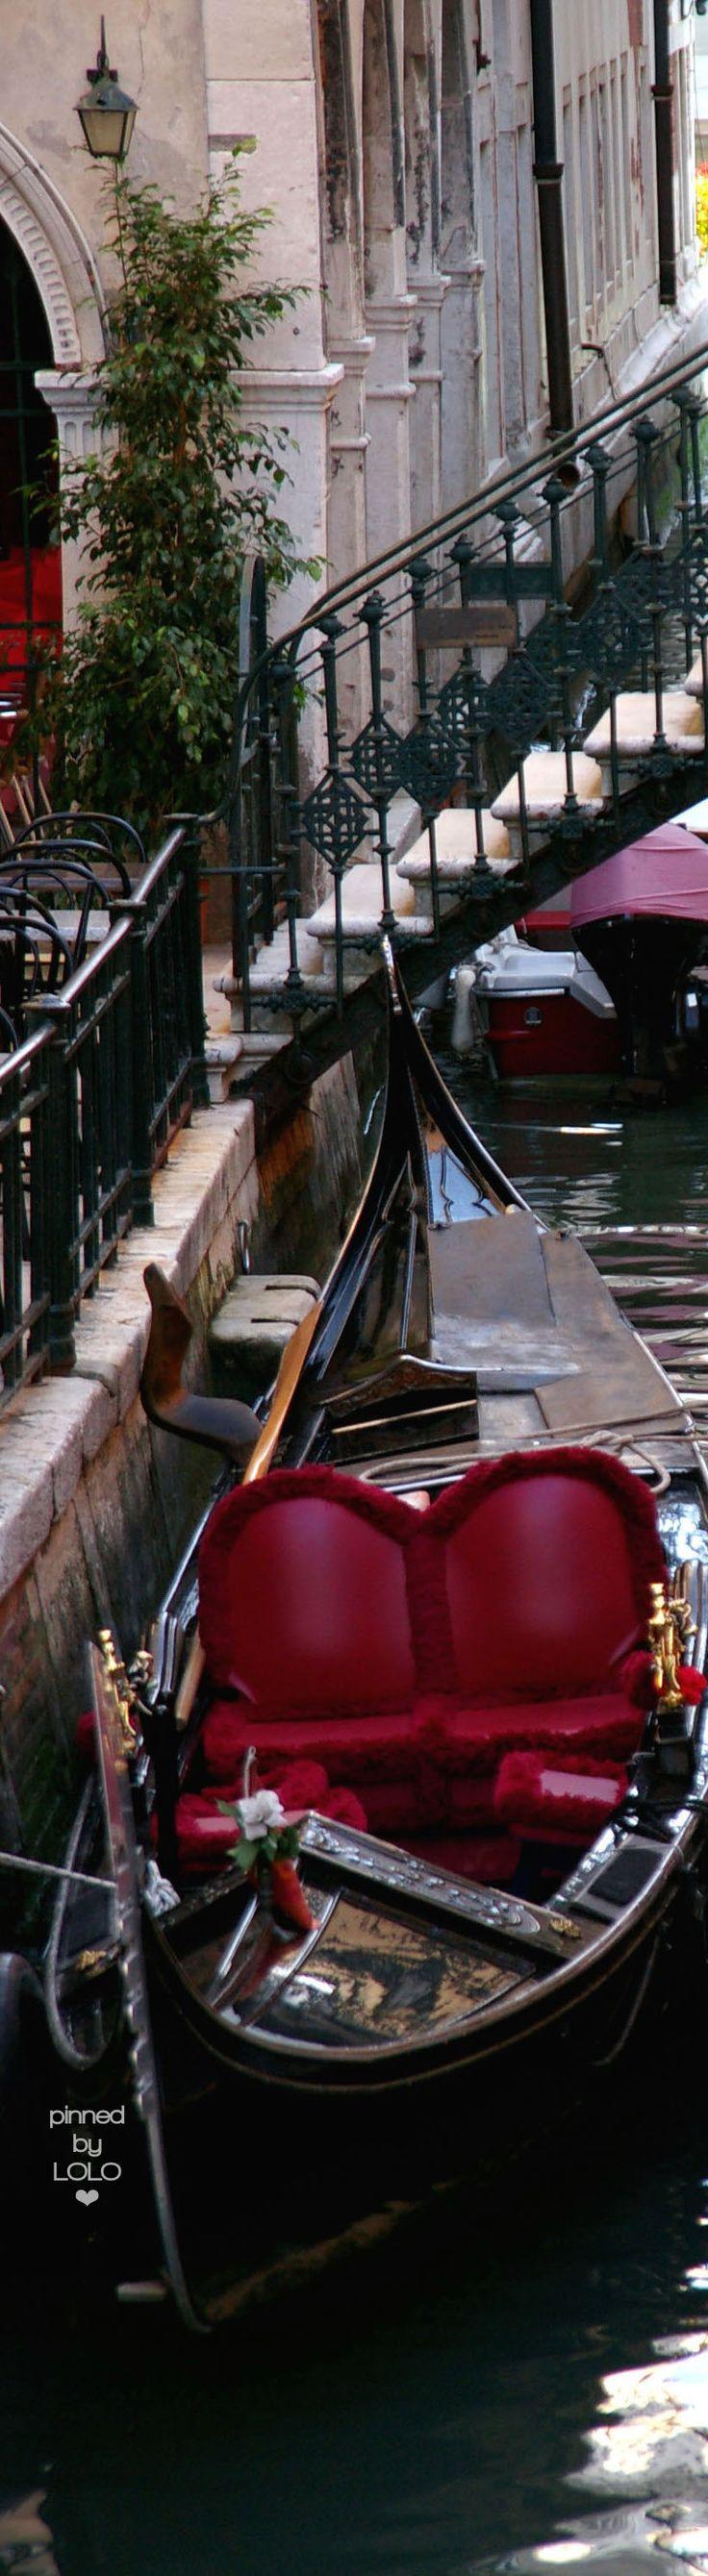 Venice Canal   LOLO❤